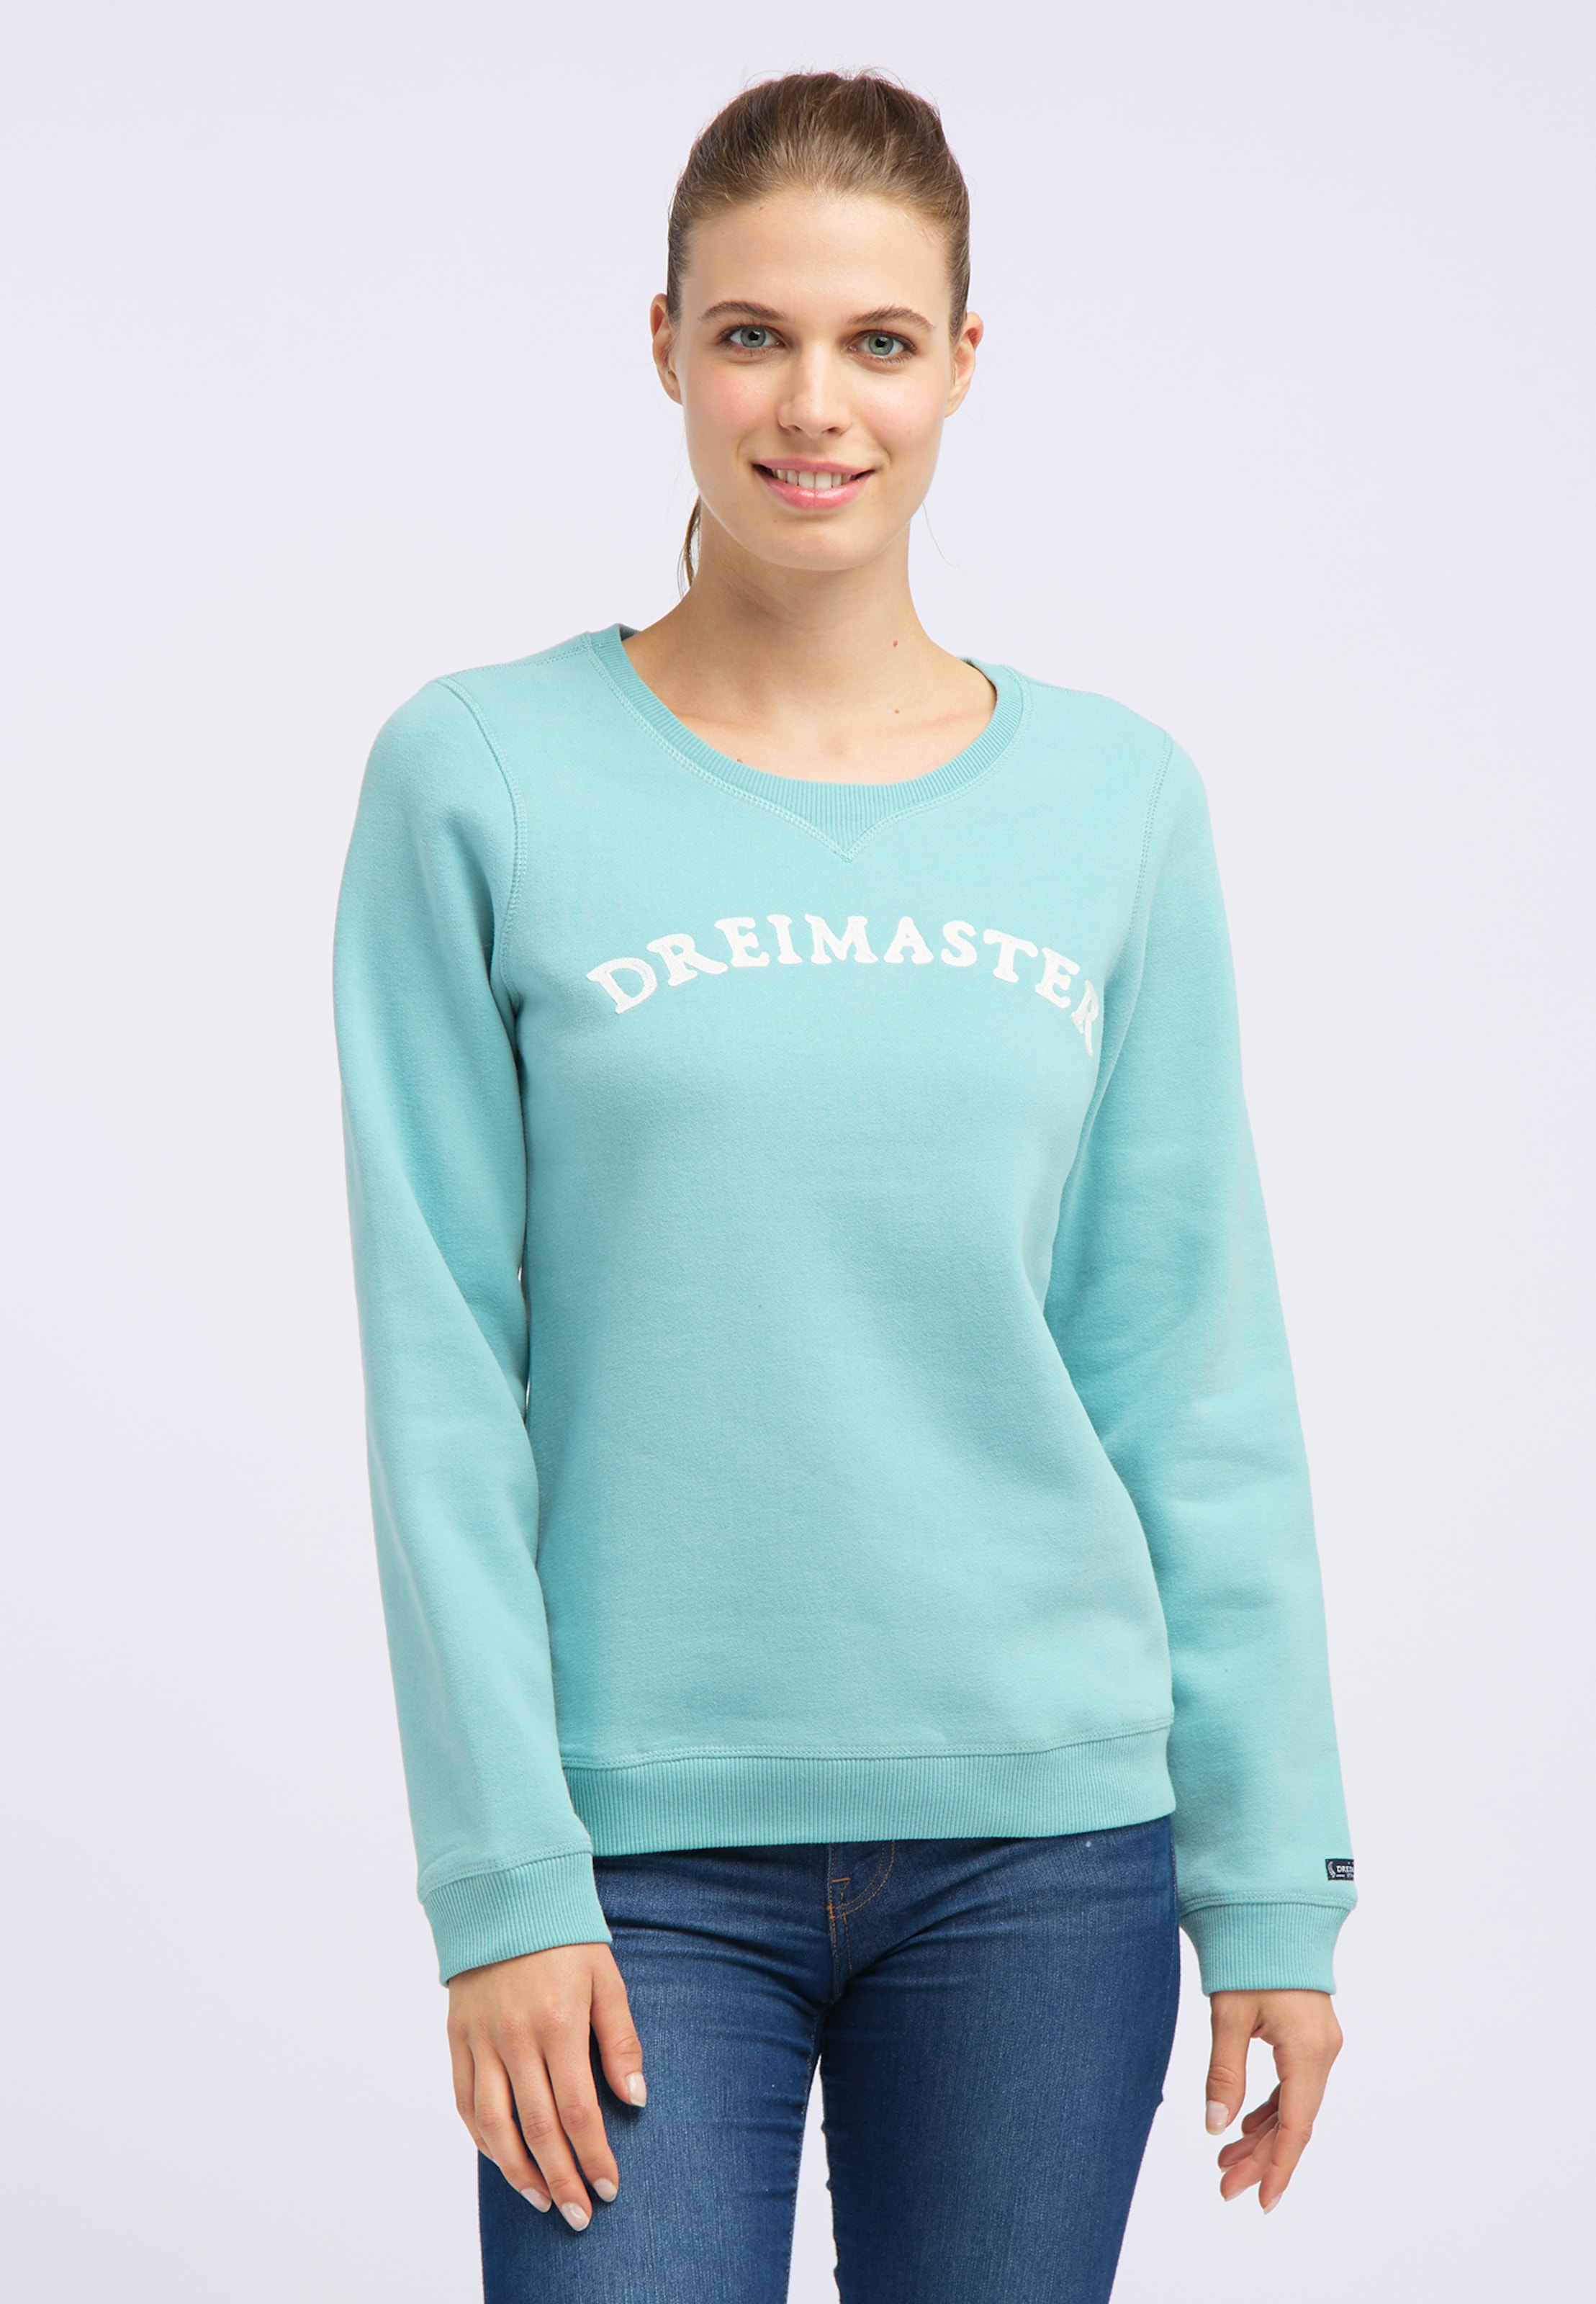 En TurquoiseBlanc Sweat shirt Dreimaster iuOXwPkZTl